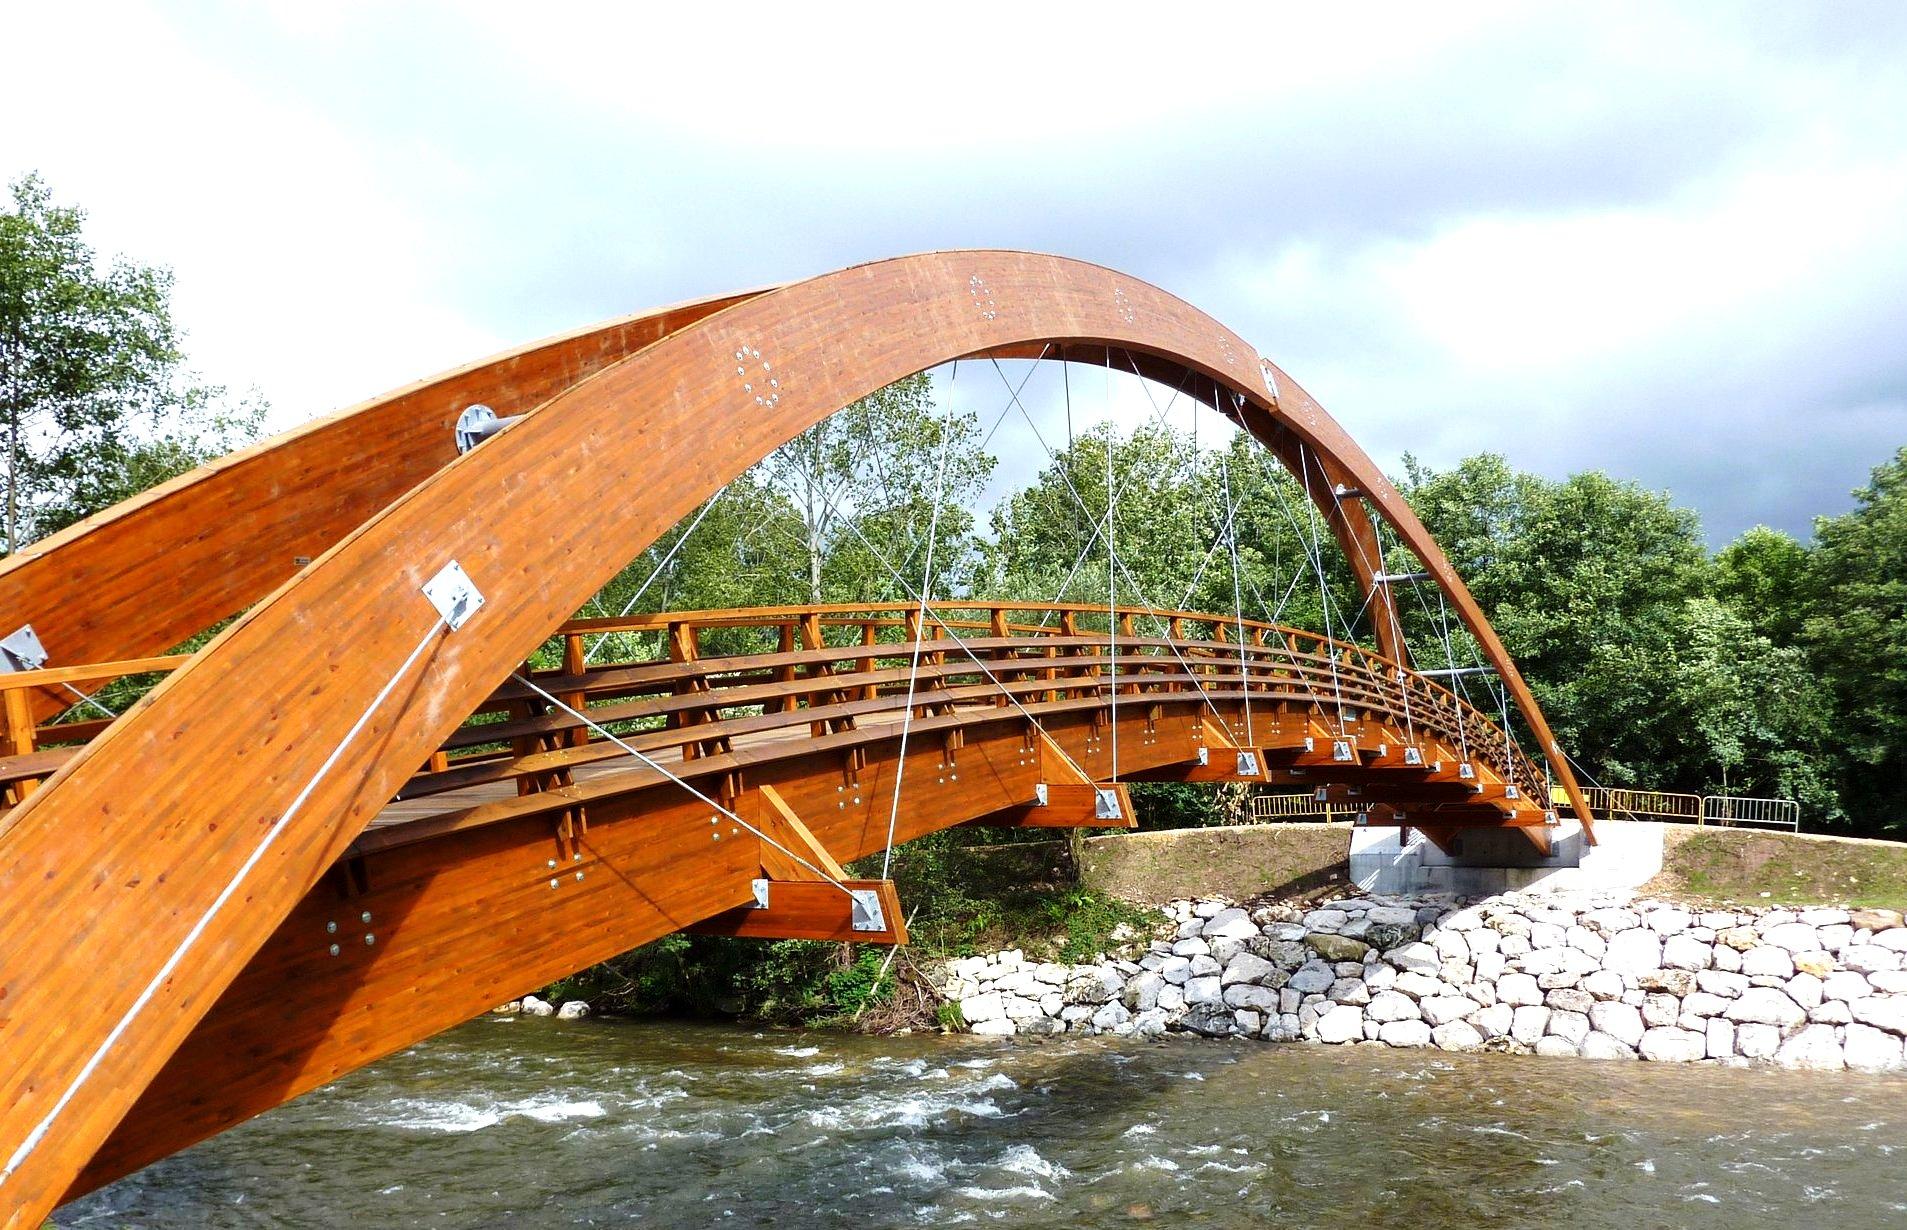 Puente 50m x 2,5m Rio Saja (Cabezon de la Sal - Mazcuerras)